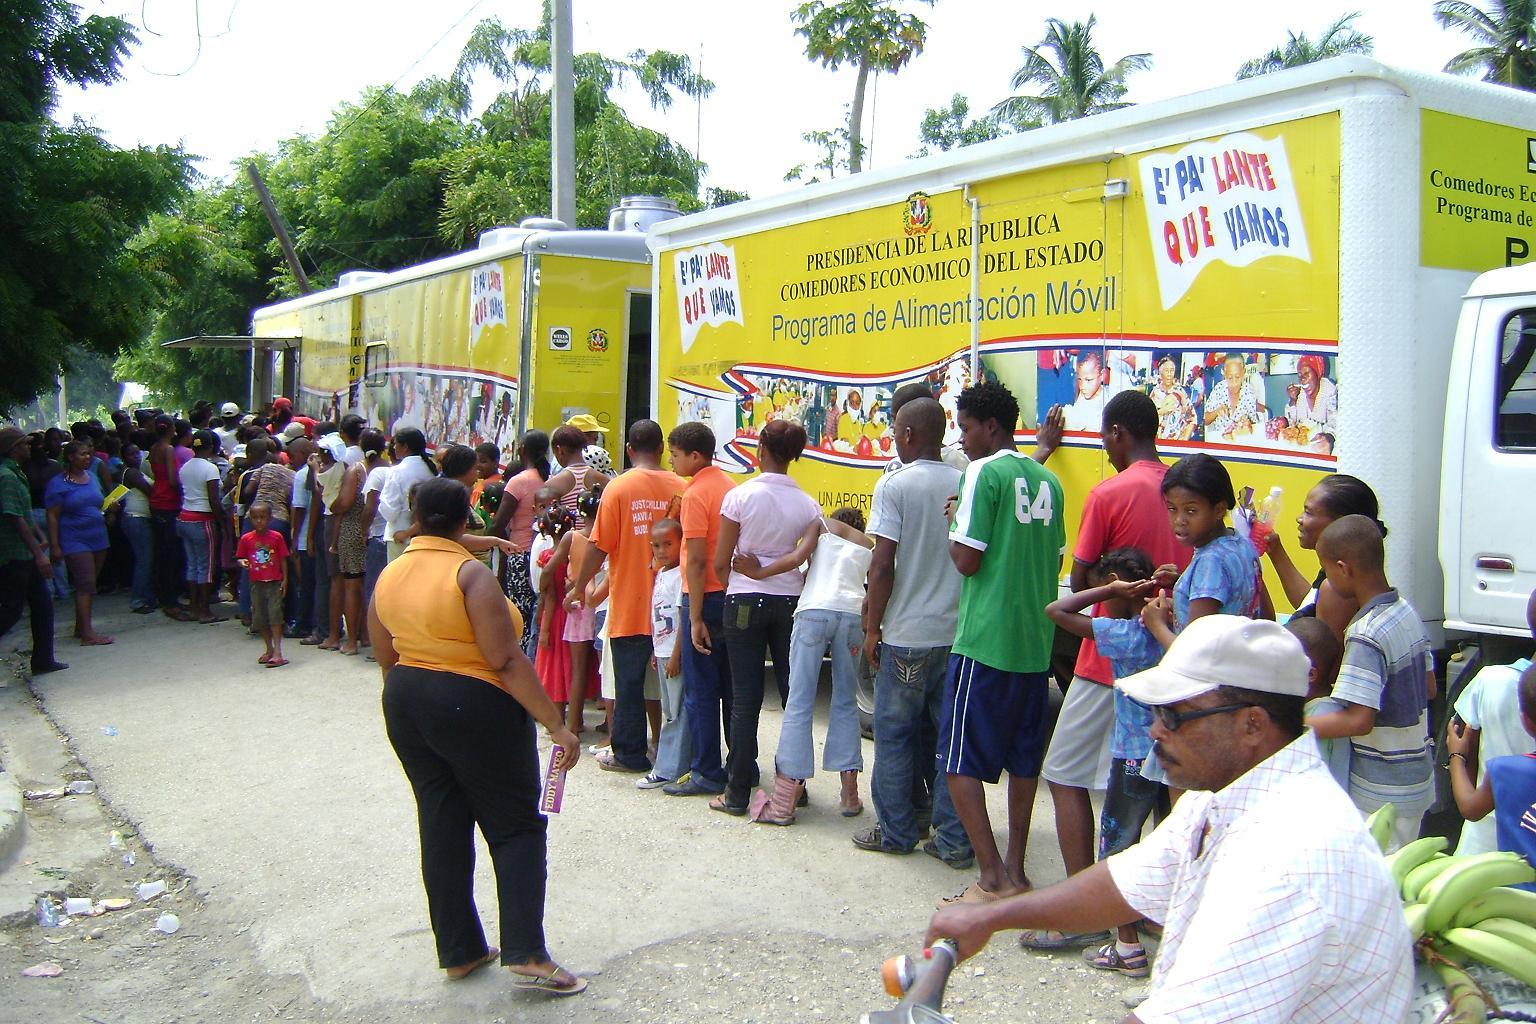 Nagua real comedores econ micos dieron comida gratis este for Comedores baratos en santiago